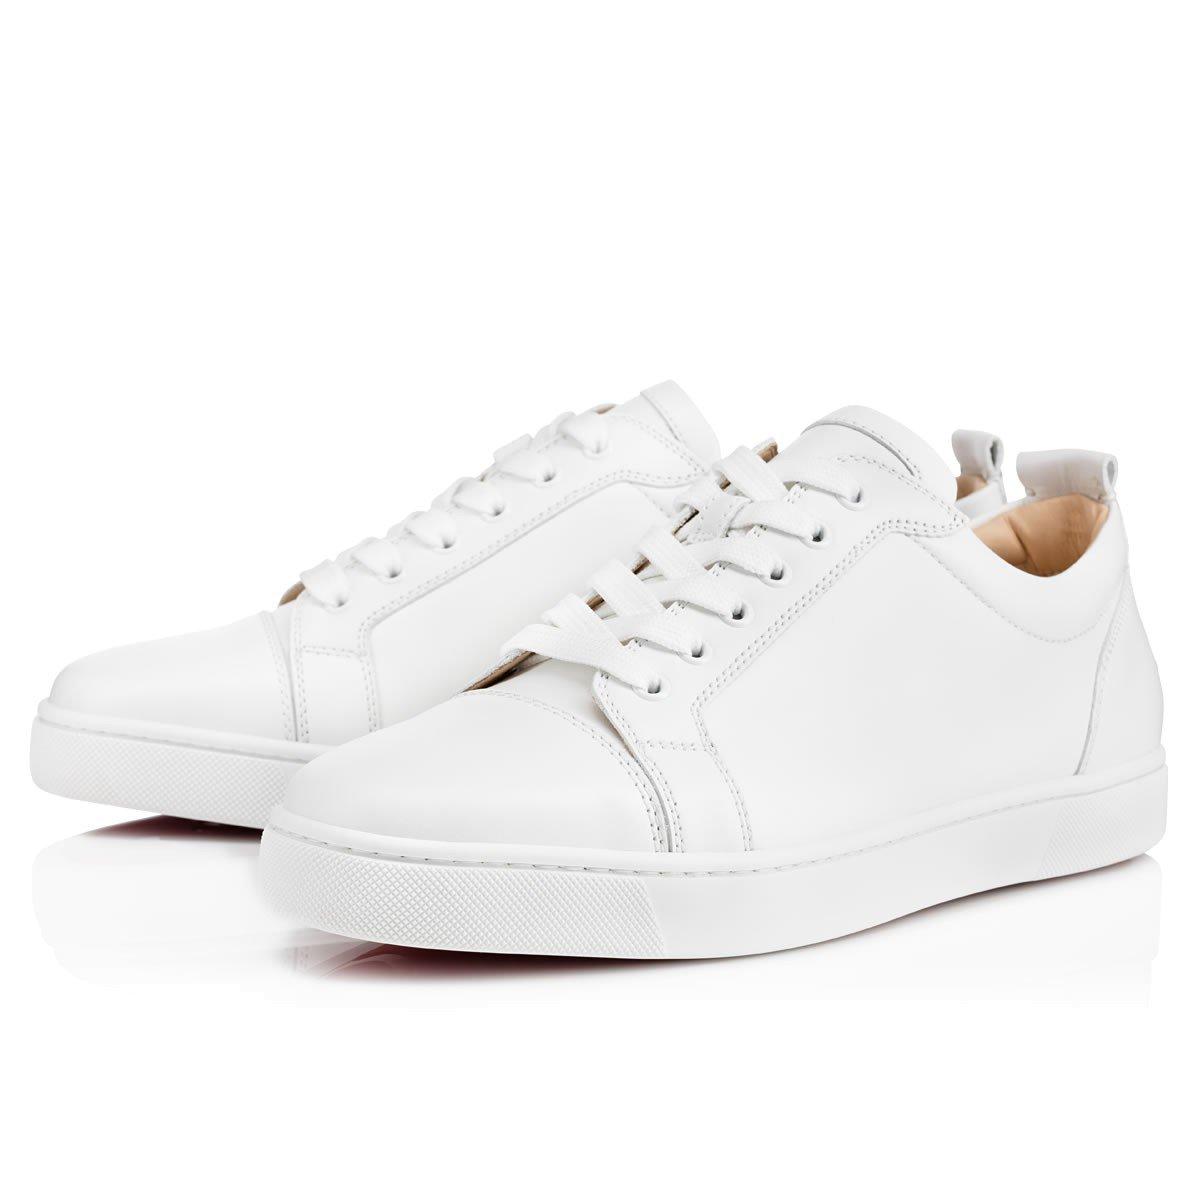 Louis Junior Men's Flat White Leather - Men Shoes - Christian Louboutin